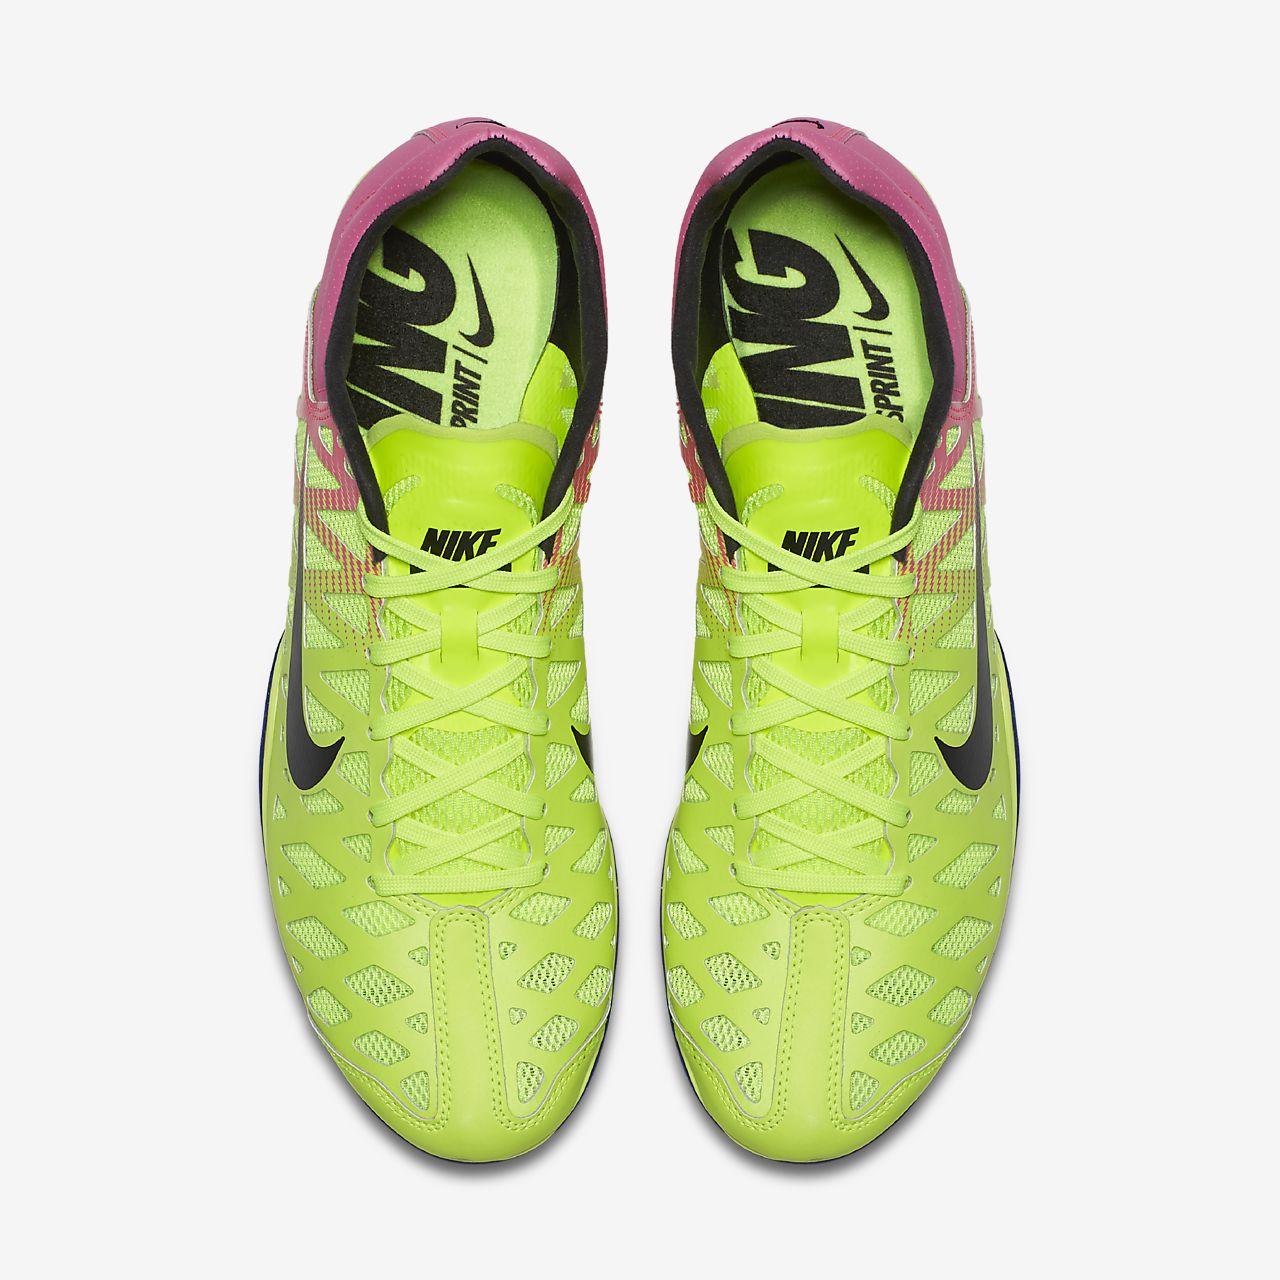 6896b22a8bd47 Nike Zoom Maxcat 4 Sprint Running Spikes Mens Yellow